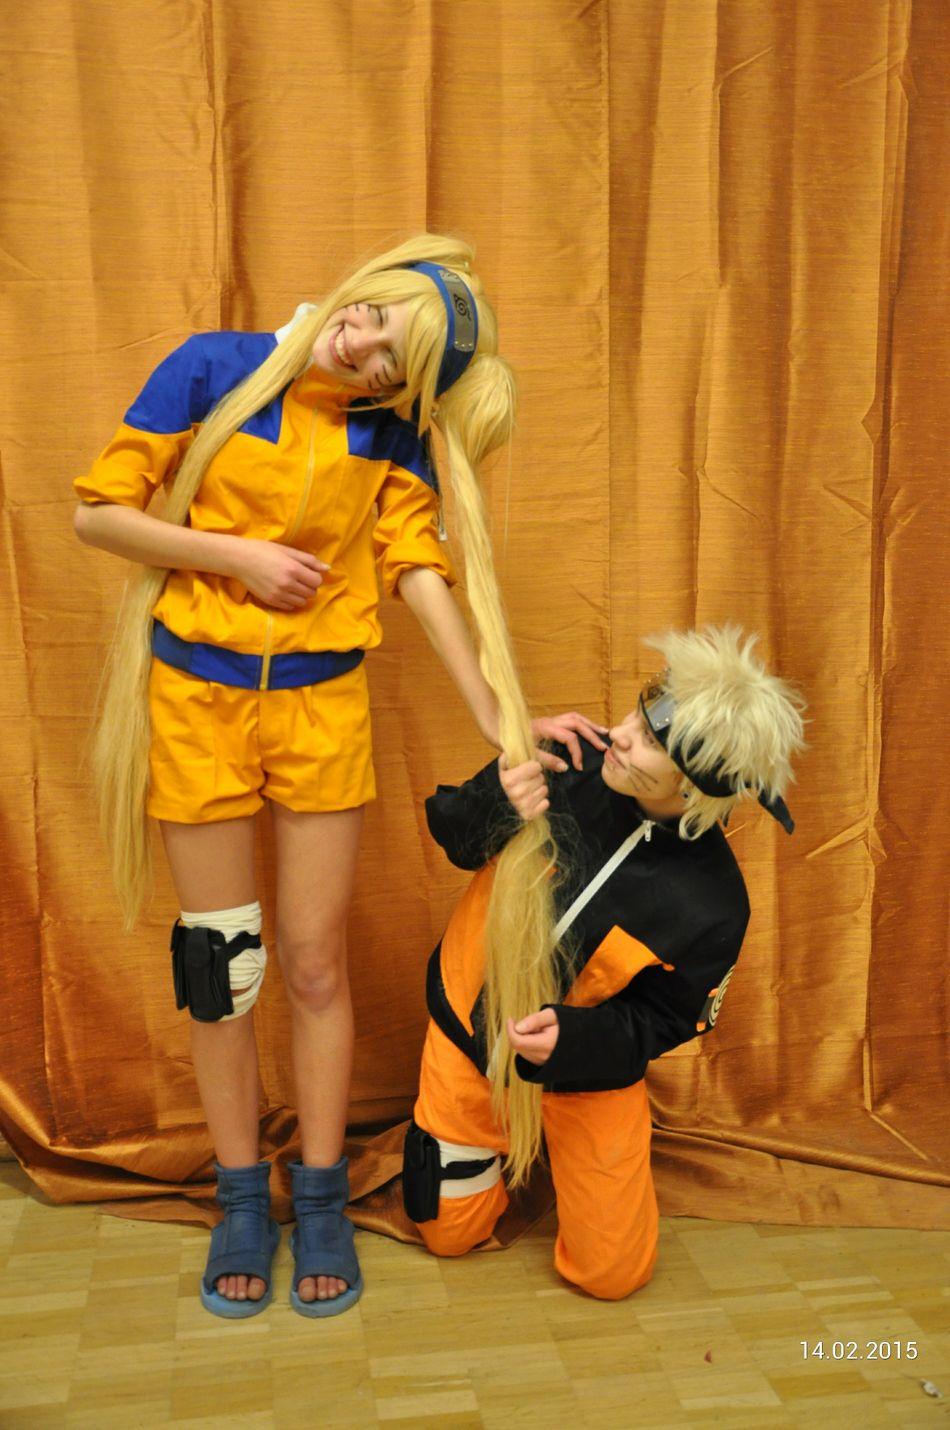 Naruto Naruto Shippuden  Naruko Cosplay Cosplayer Cosplaying Cosplay<3 Fun Cosplay Shoot Anime Cosplay me like male naruto